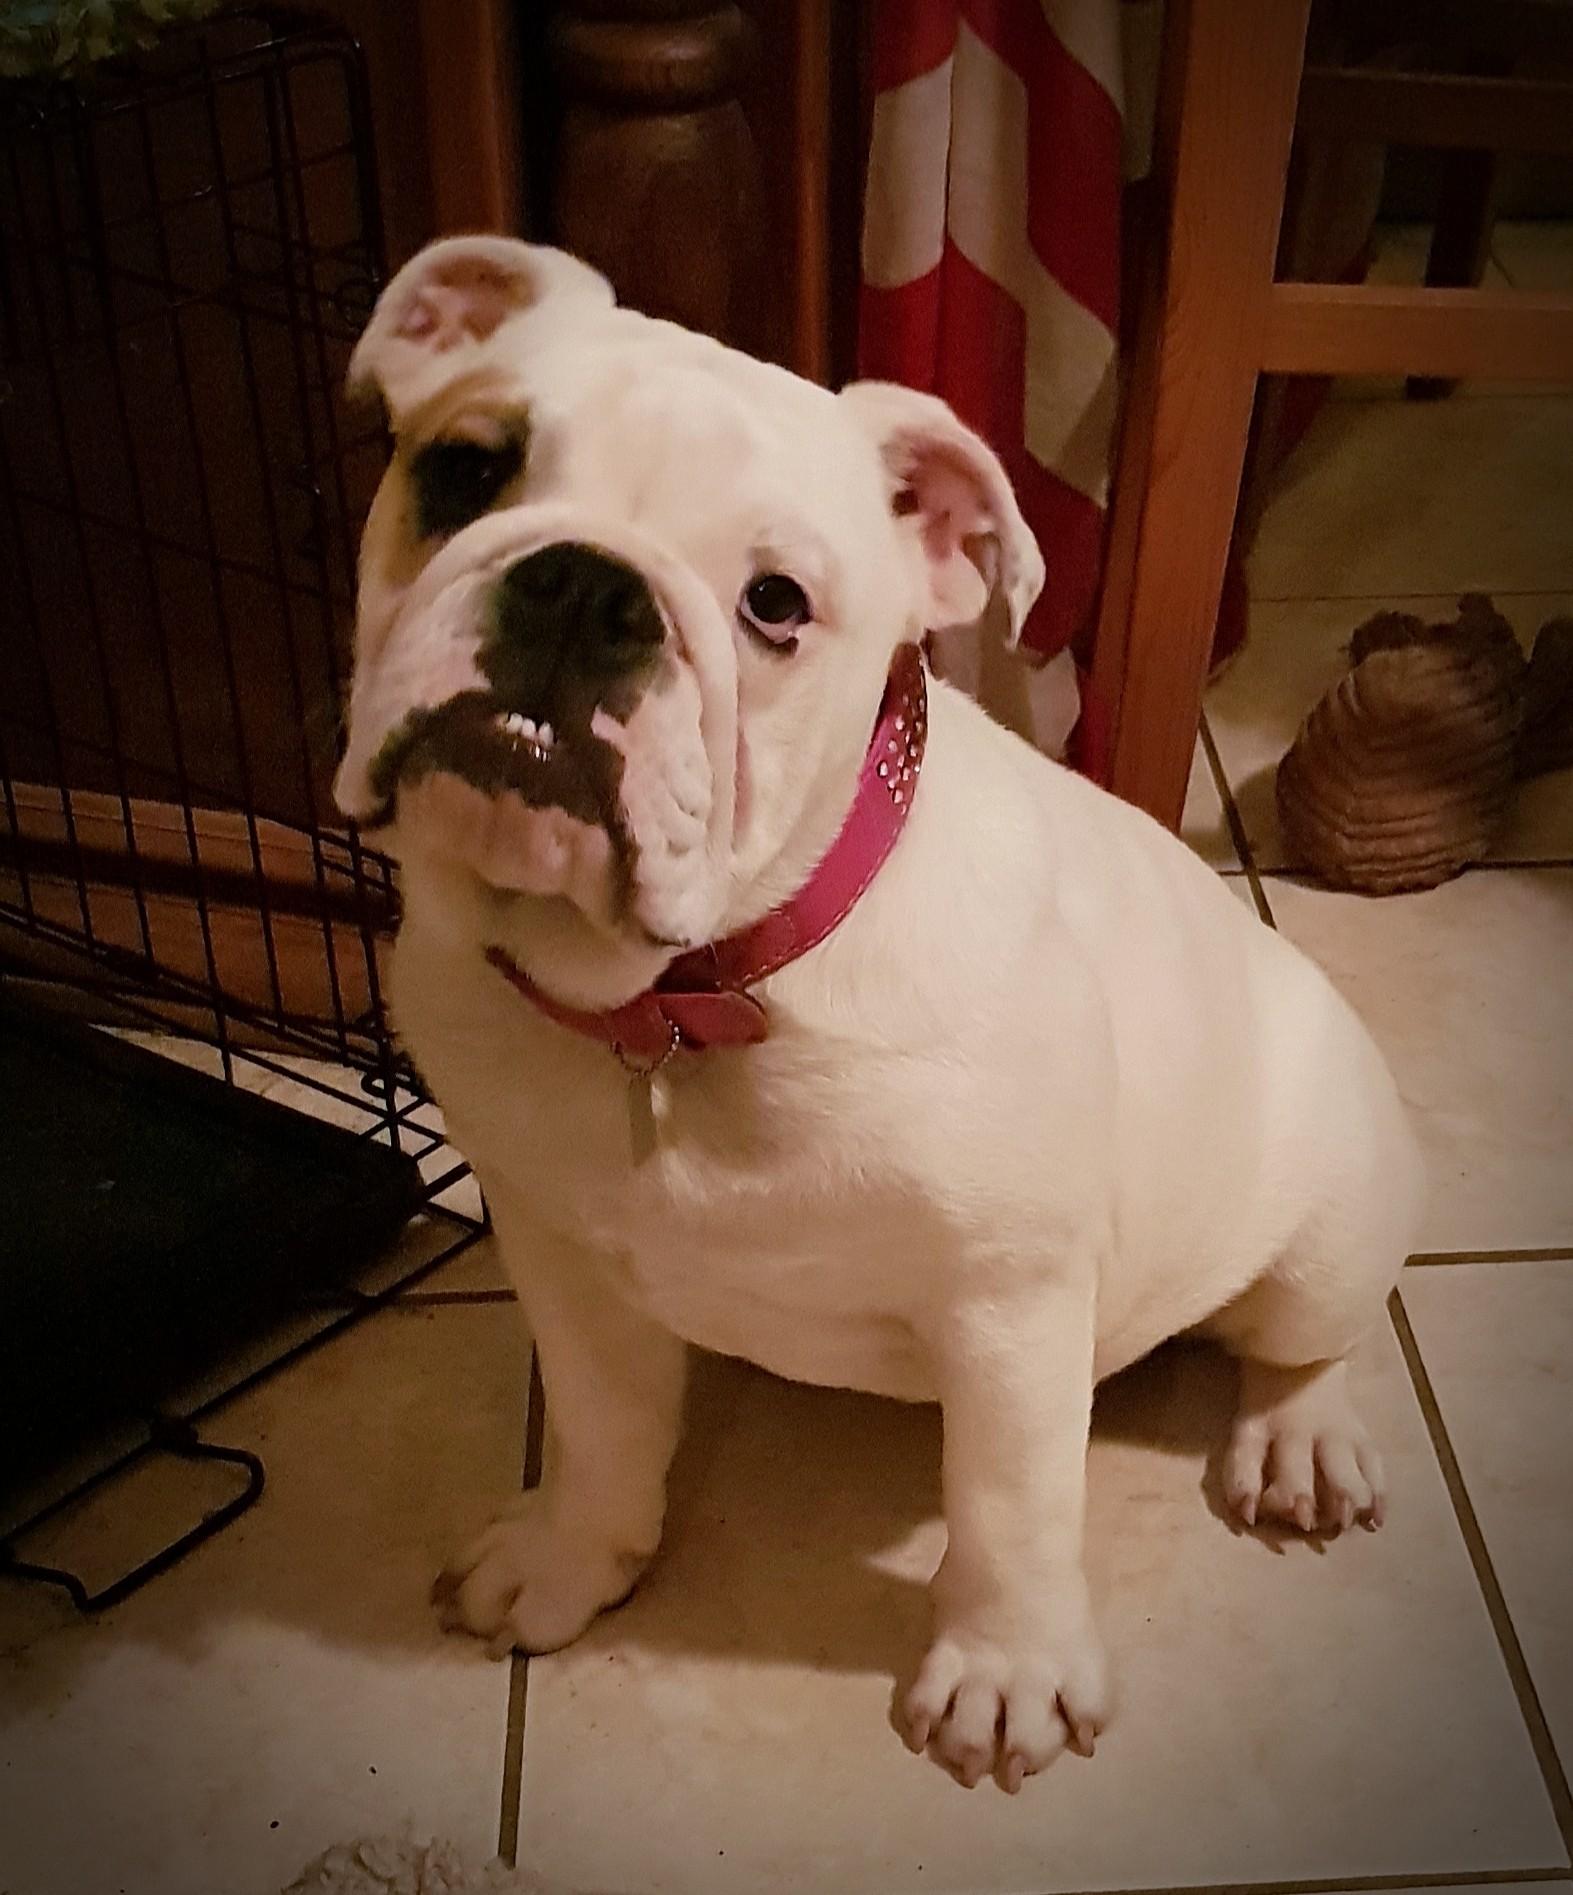 Les Bulldog Anglais de l'affixe D'an Nor Vras